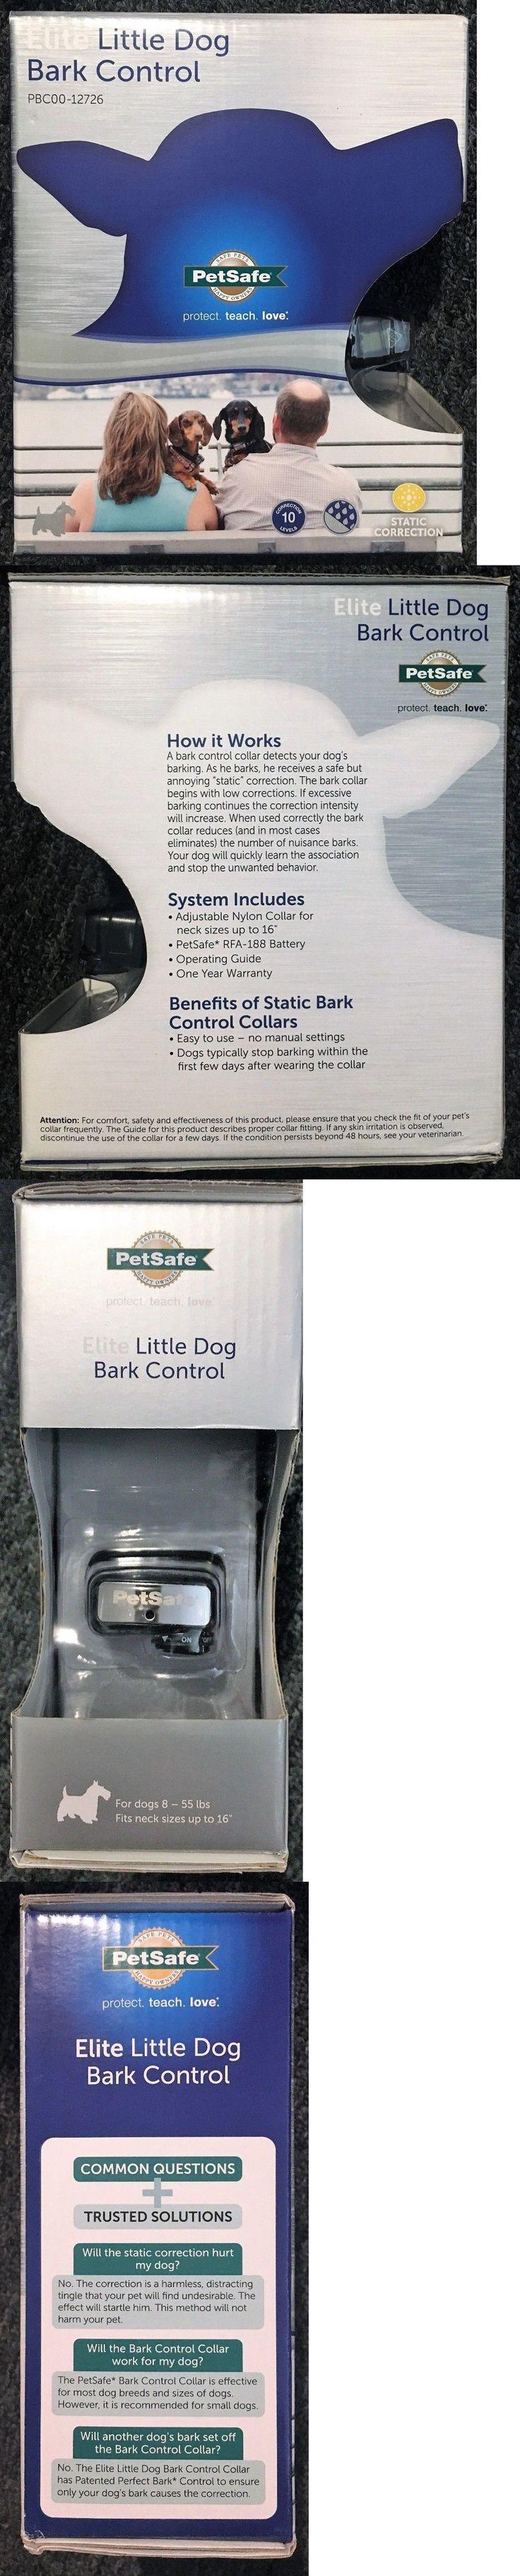 Bark Collars 66774: Petsafe Elite Little Dog Bark Control -> BUY IT NOW ONLY: $54.99 on eBay!